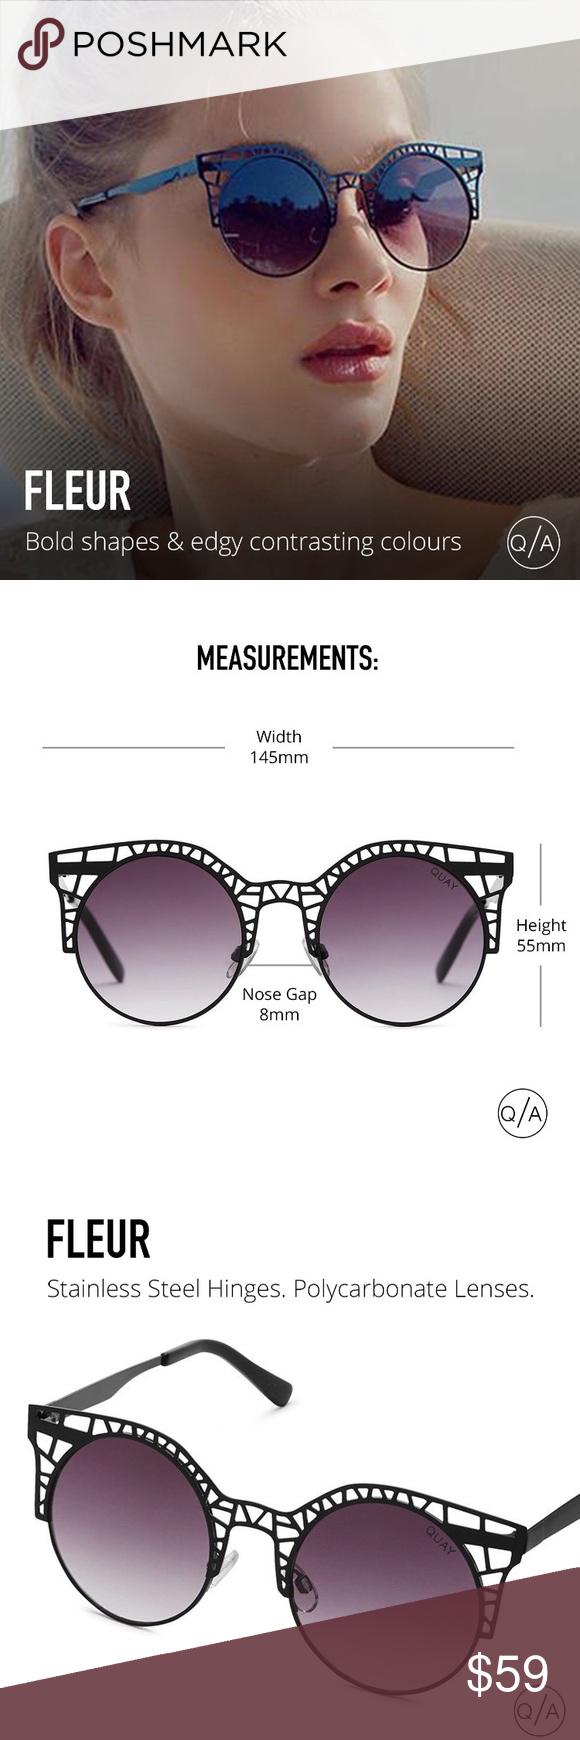 86b3f1e002 NWT Quay Australia Fleur Cat Eye Sunglasses ➖NWT ➖BRAND   Quay Australia  ➖STYLE